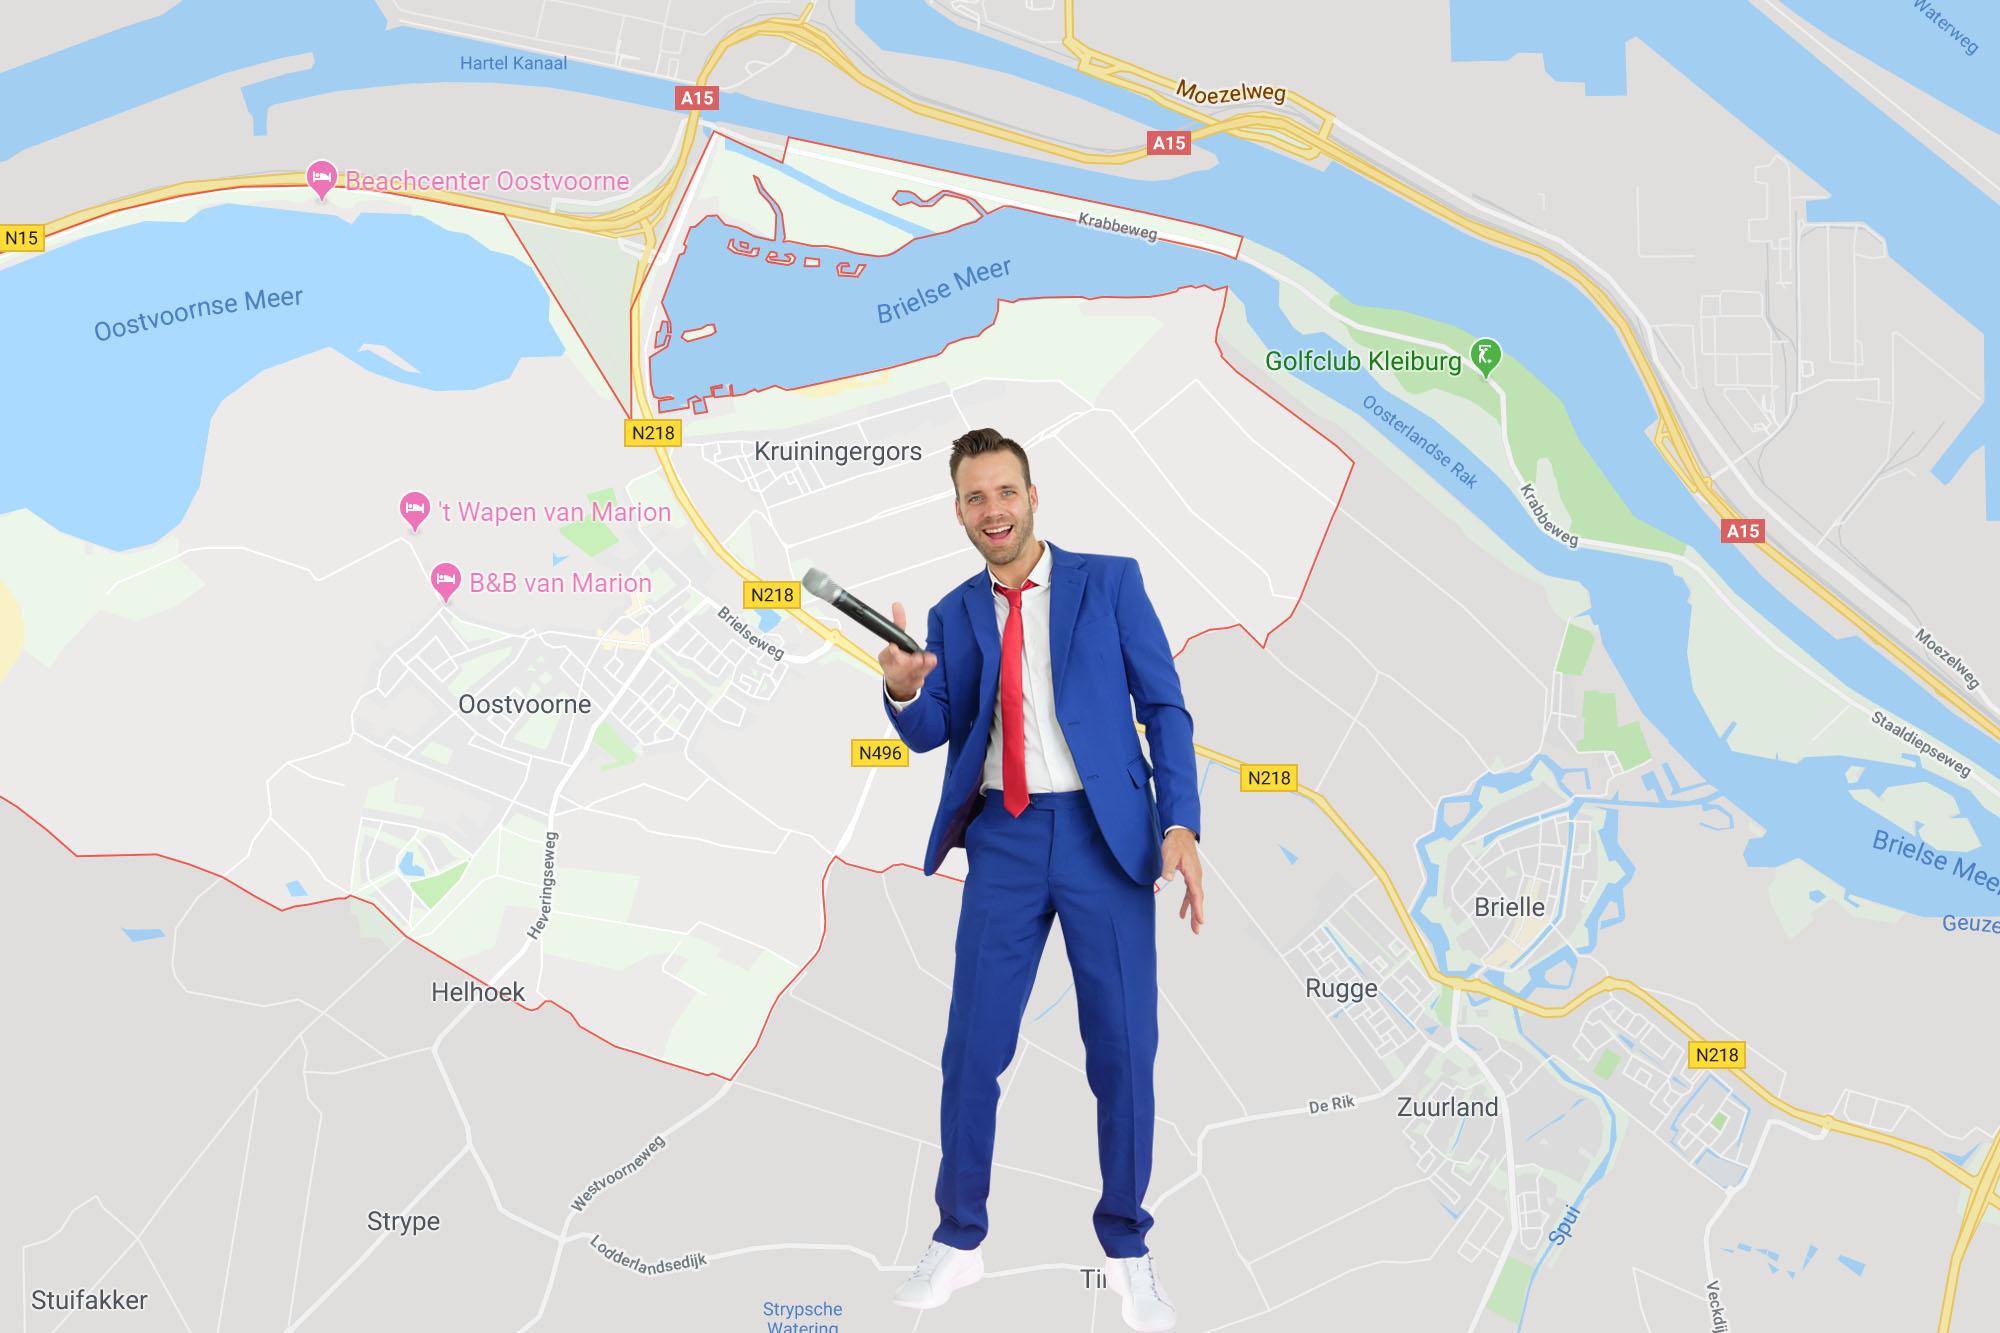 DJ Oostvoorne